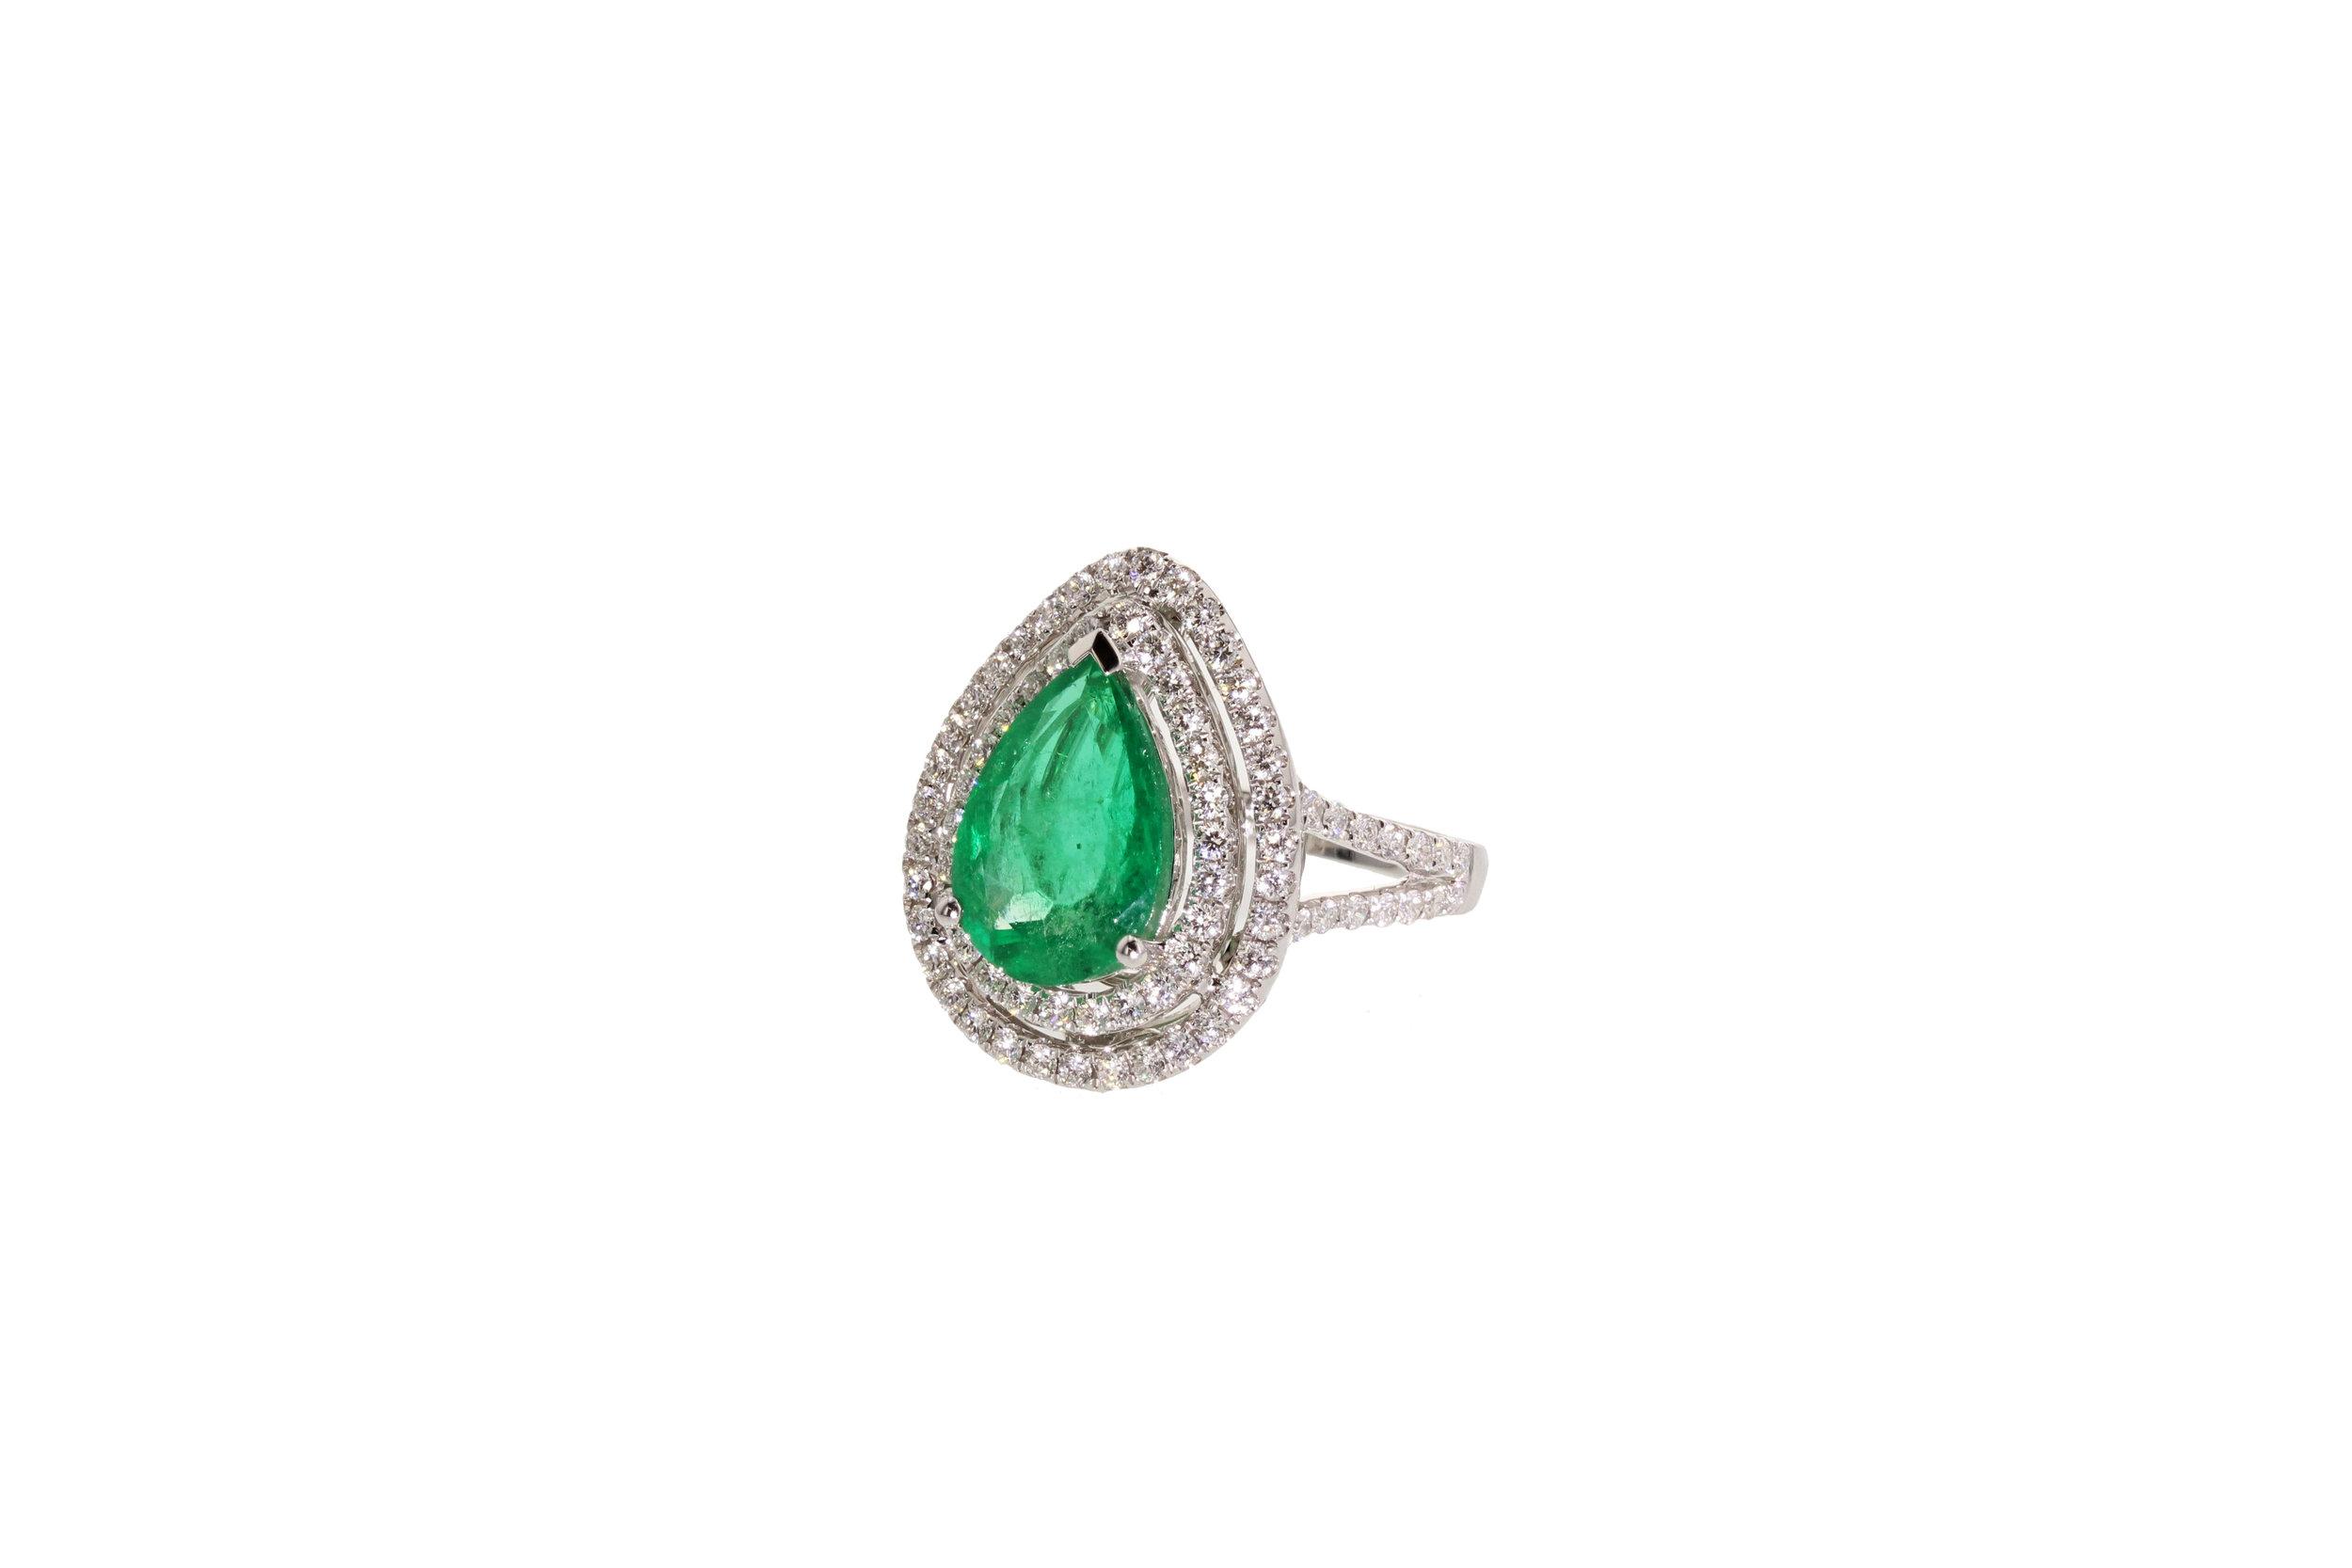 18kt White Gold Emerald and Diamond ring 3.05ct Emerald,1.06ctw Diamonds. $27,300